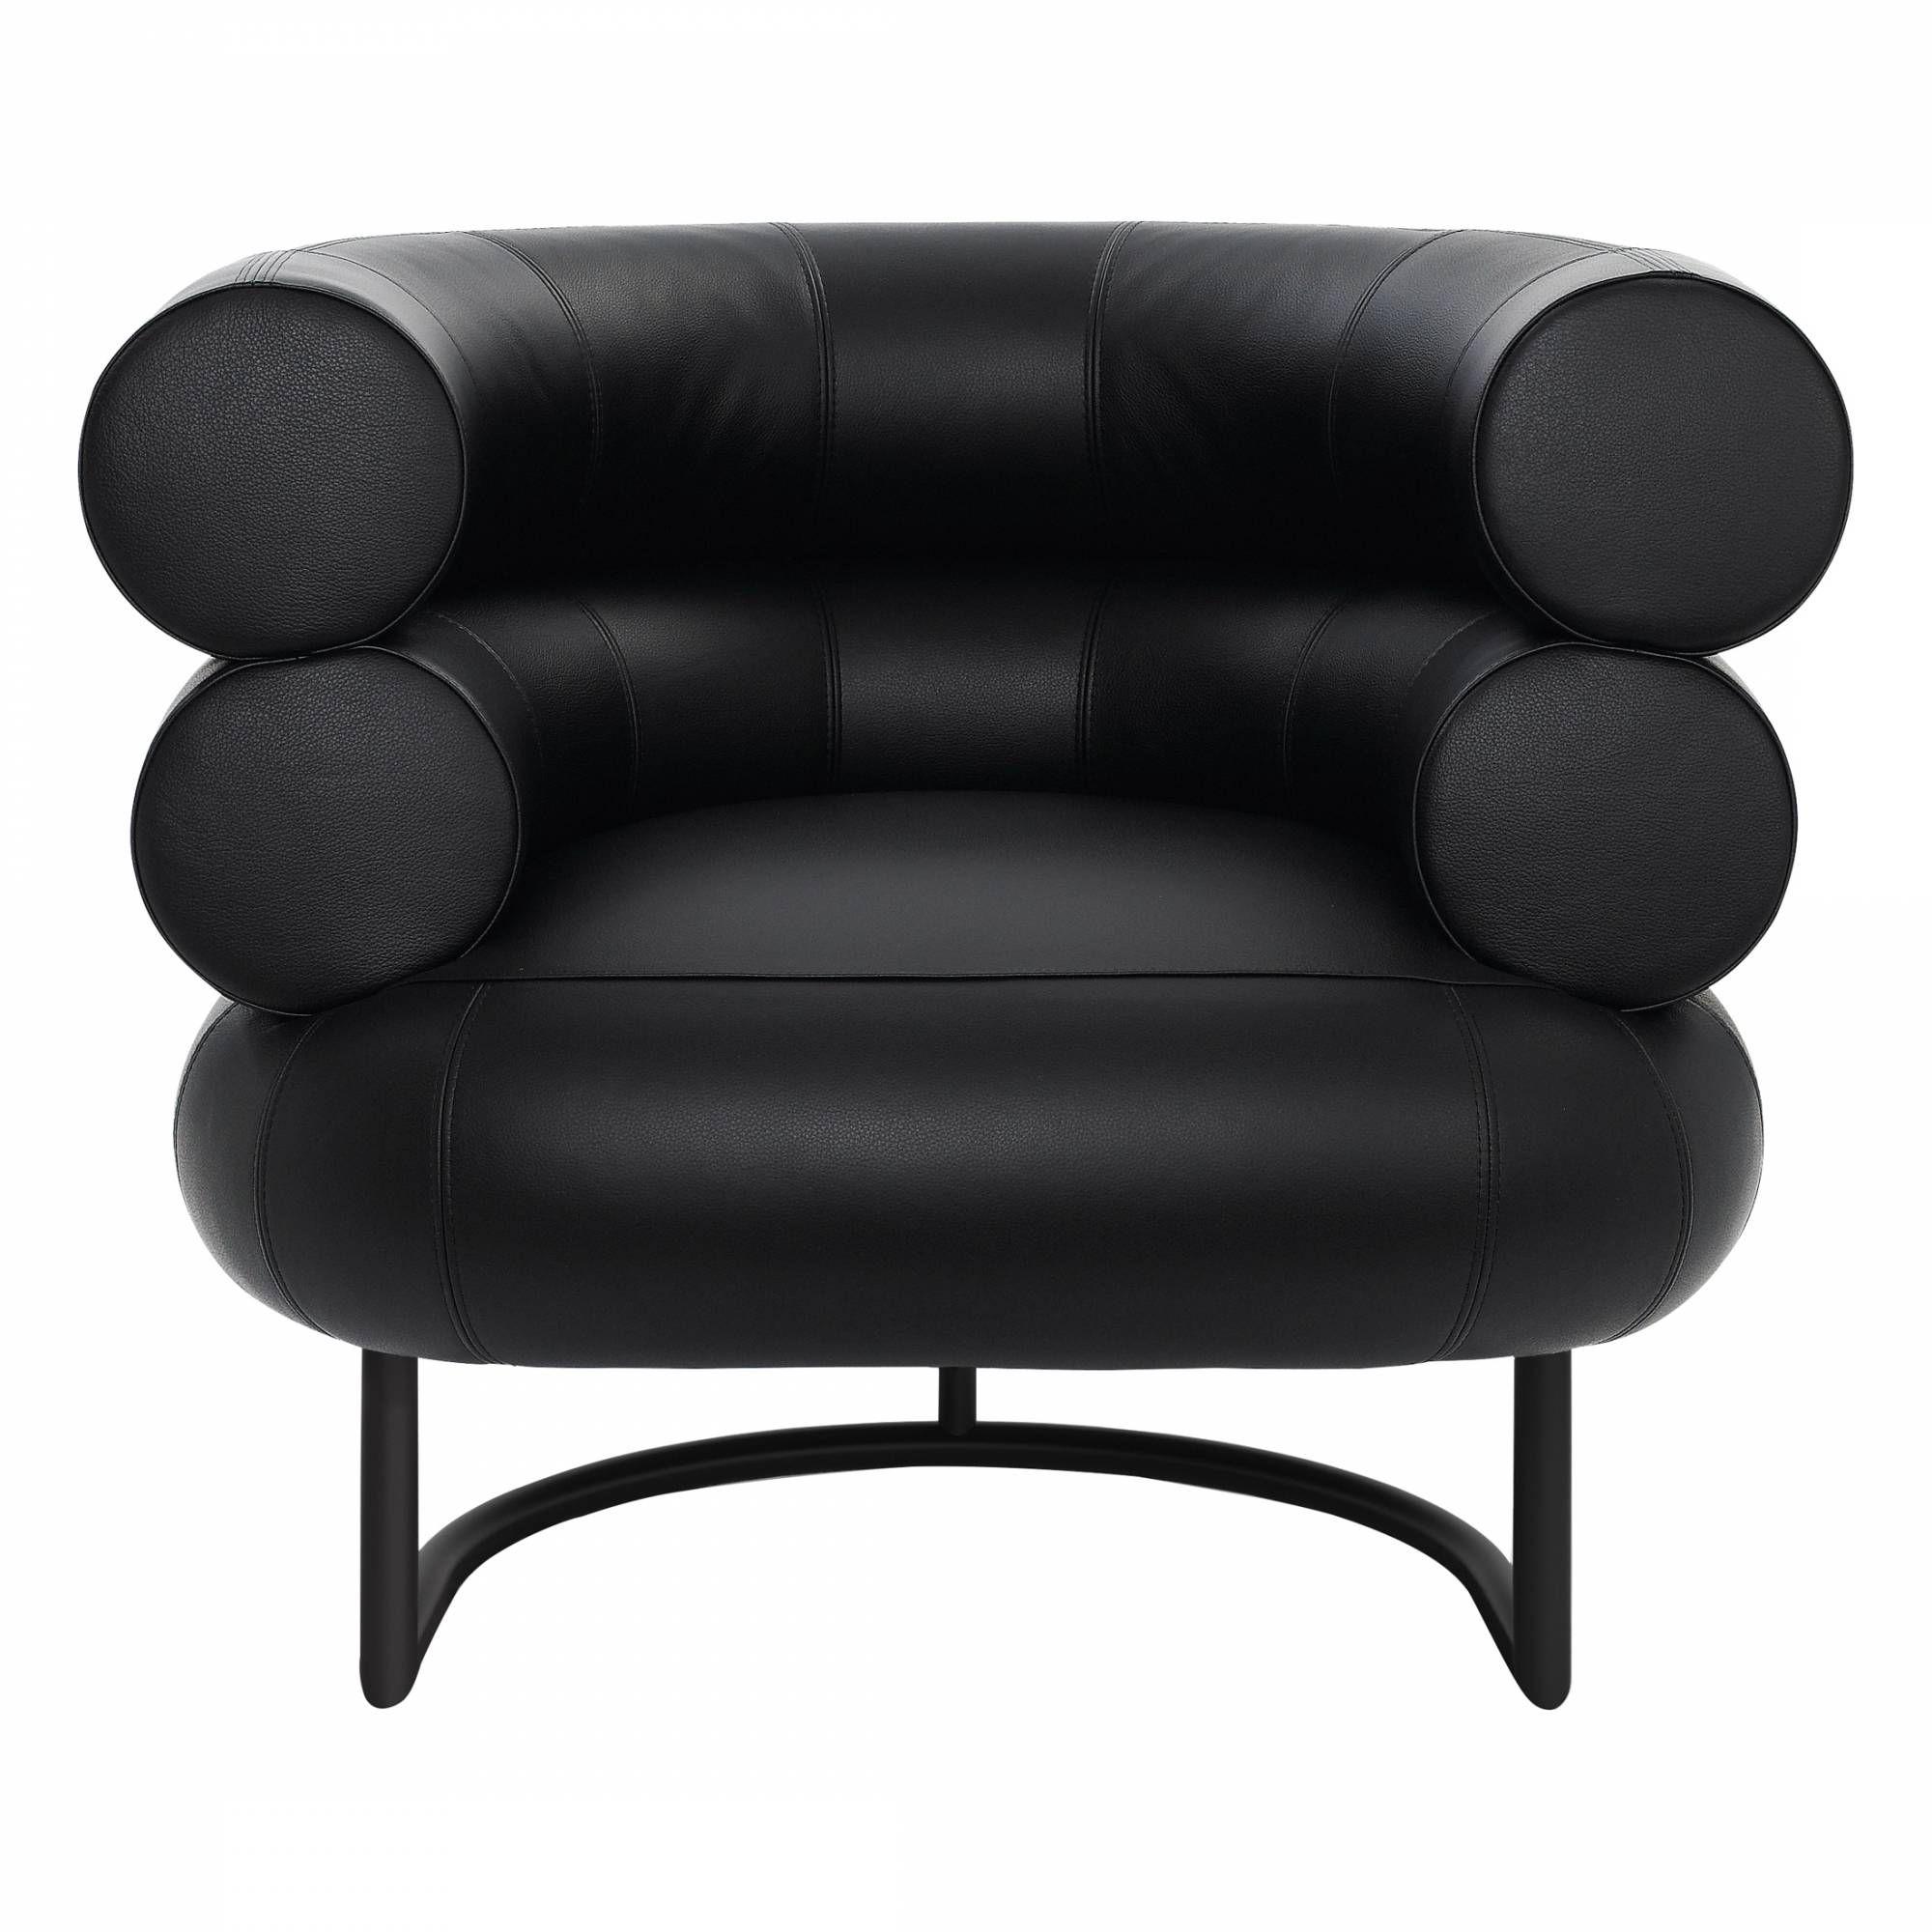 Bibendum Black leather armchair, Armchair, Eileen gray